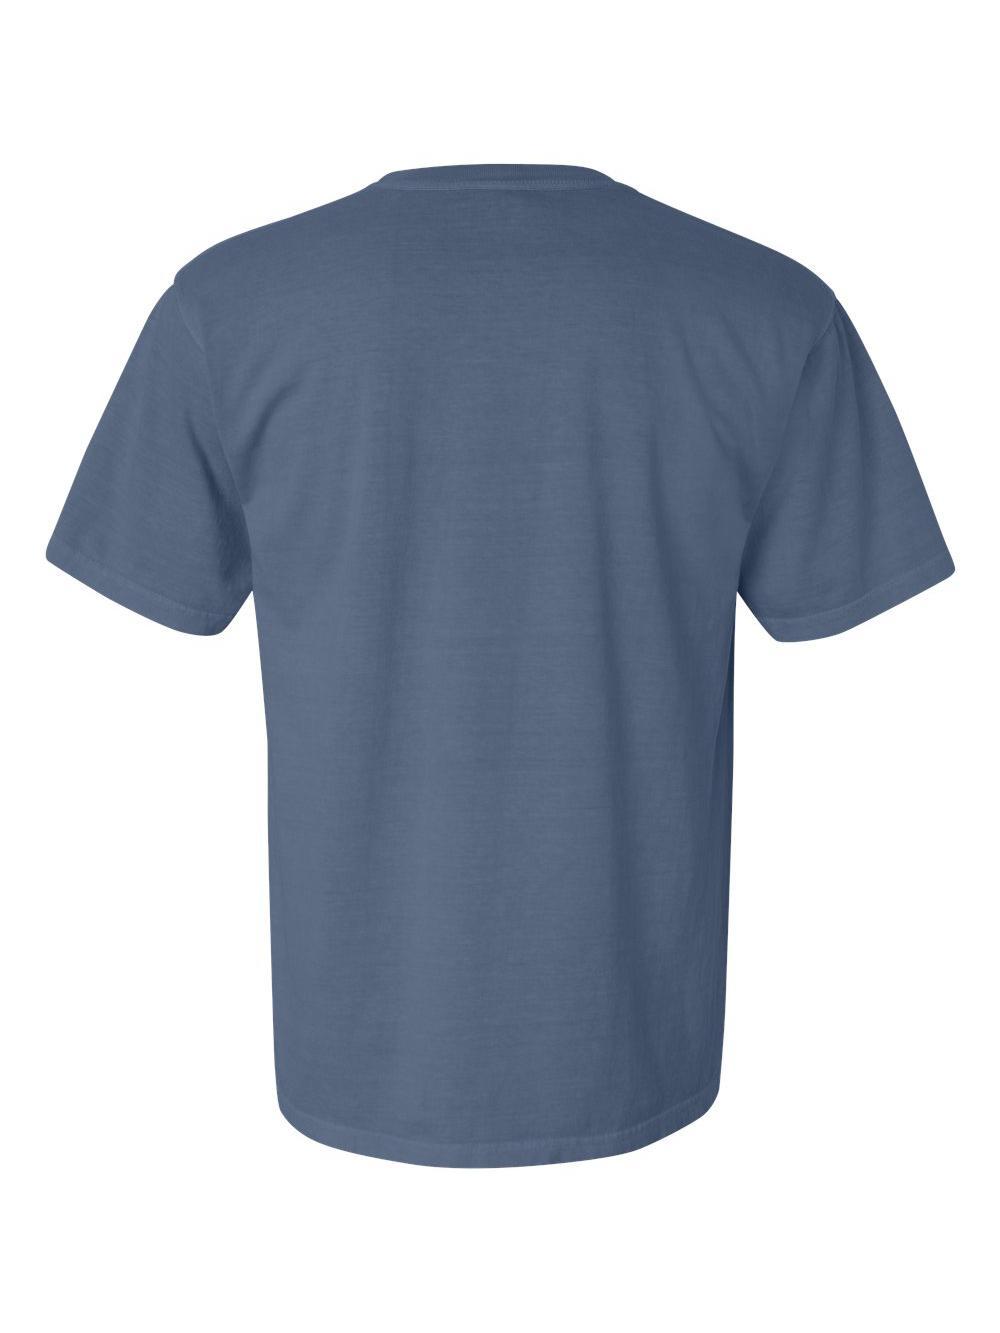 Comfort-Colors-Garment-Dyed-Heavyweight-Ringspun-Short-Sleeve-Shirt-1717 thumbnail 16